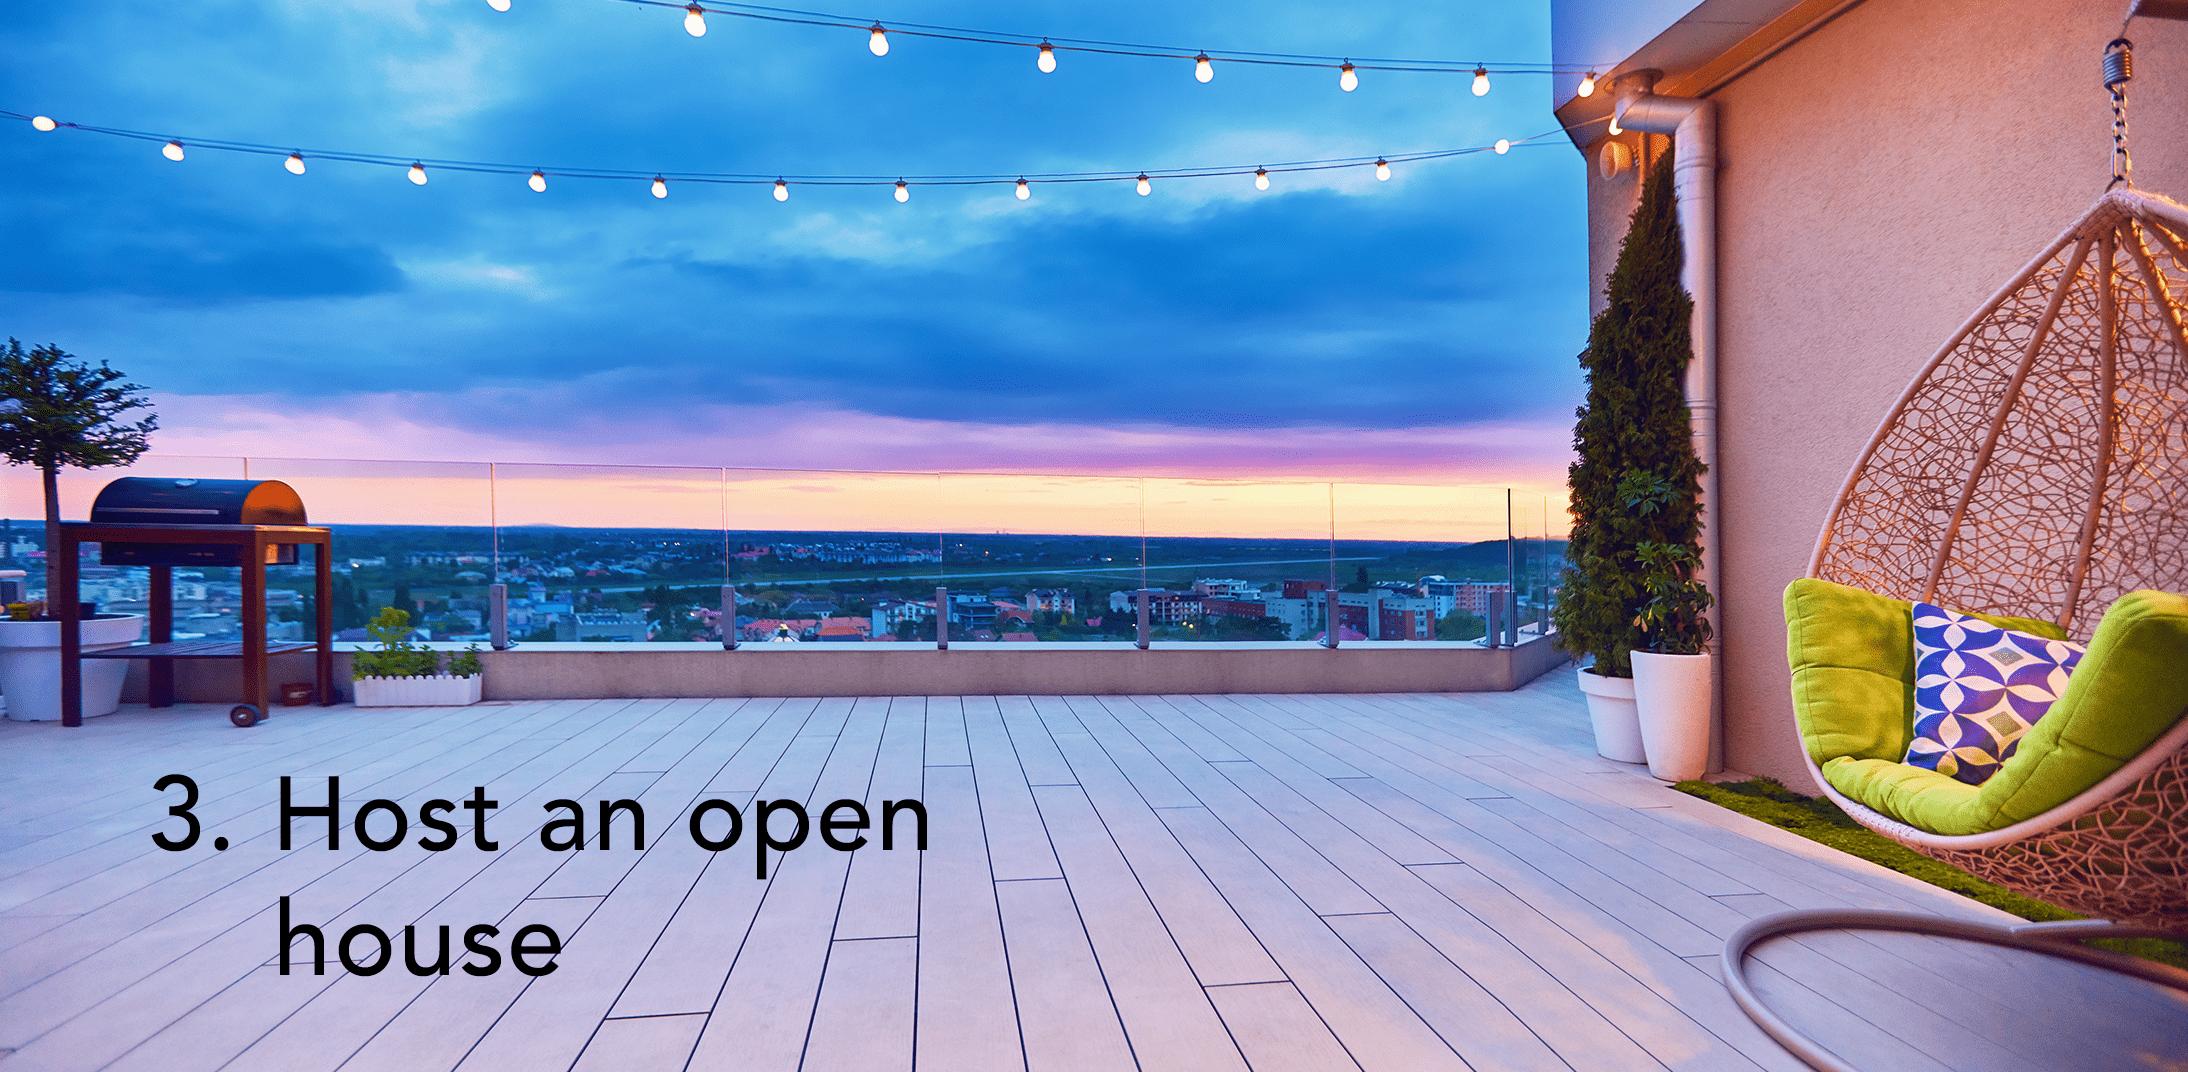 Apartment Marketing Tips - Host an open house